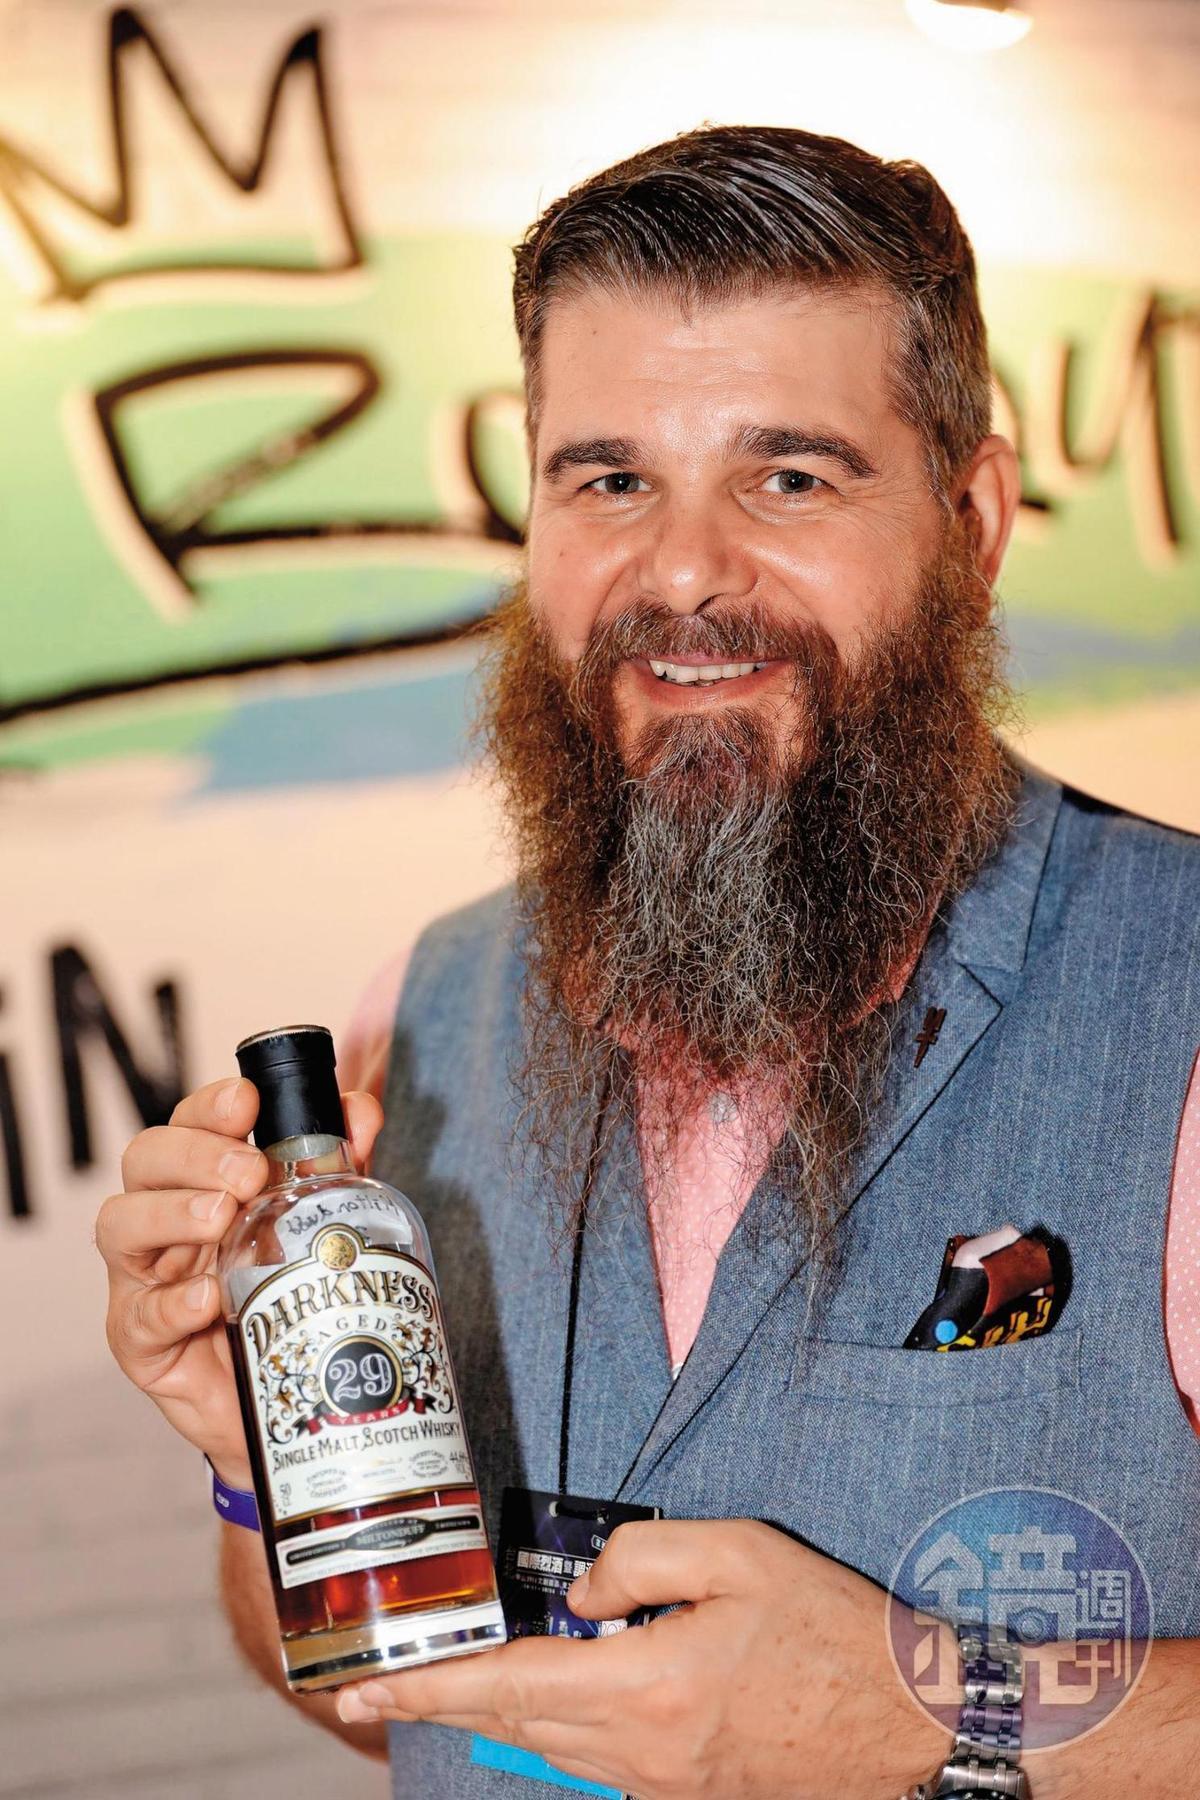 Boutique Y的品牌大使Dave Worthington,負責該公司威士忌品牌訓練,他過去一直在亞洲擔任工程師,也曾在泰國7年。手拿Darkness 29年單麥威。